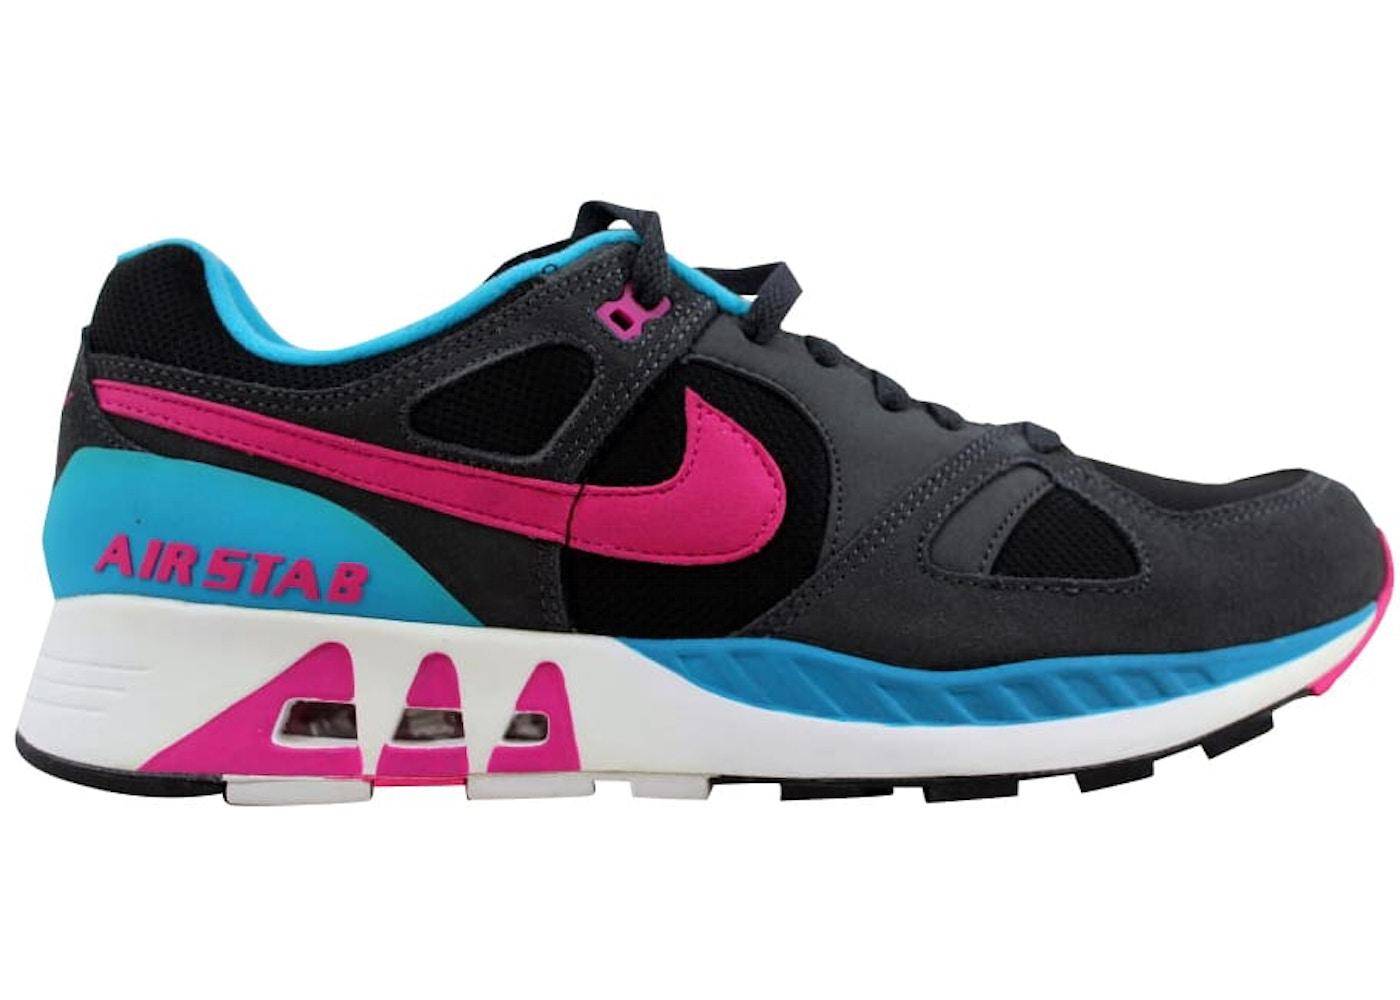 a37dc2cd309f Nike Air Stab Black Hot Pink-Anthracite-Blue Lagoon - 312451-004